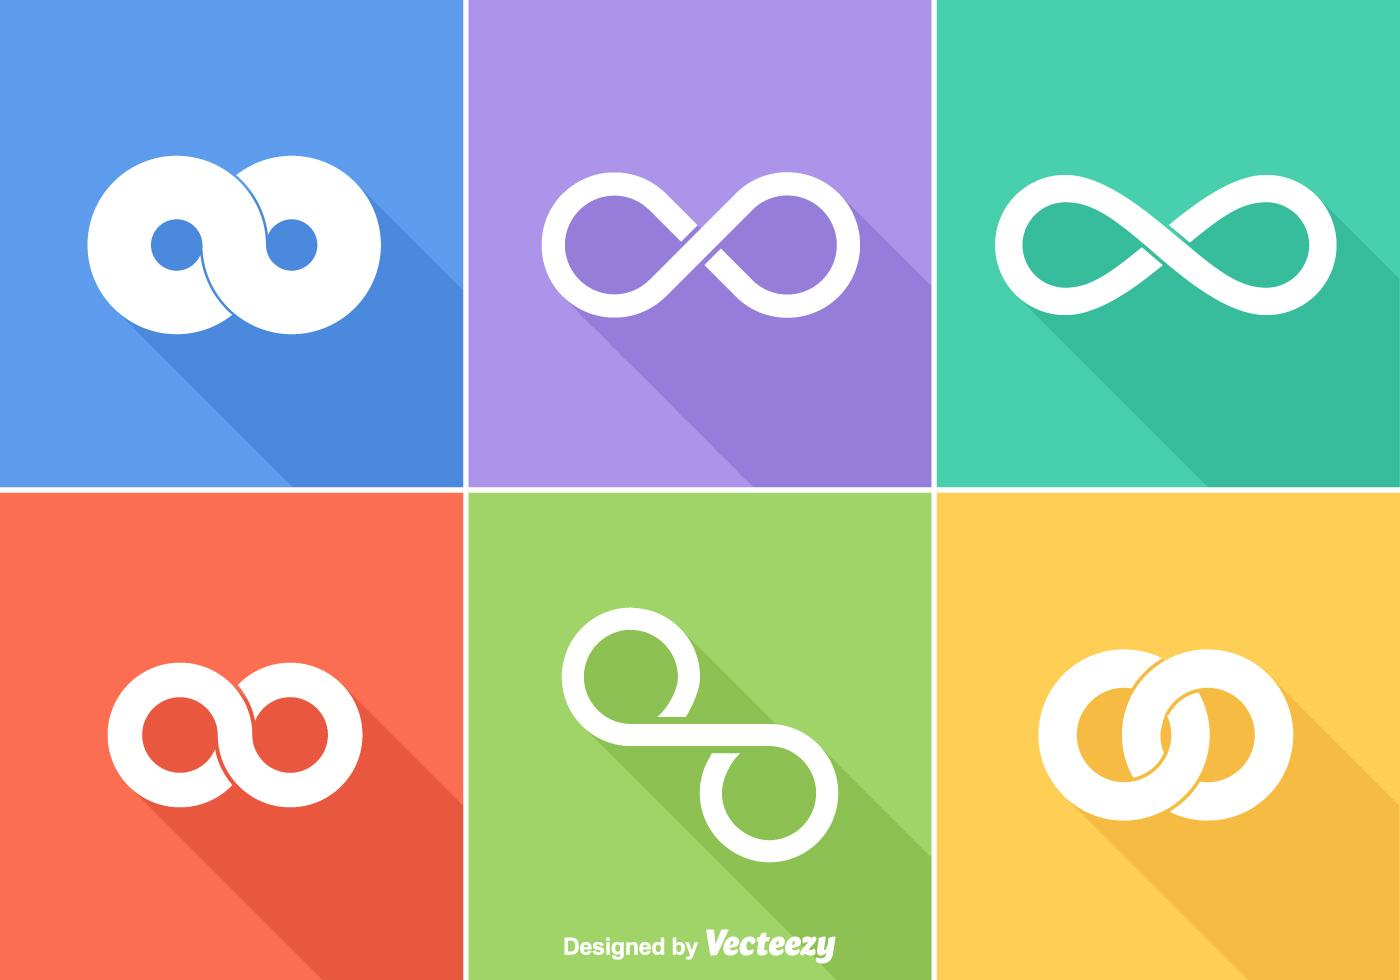 Free infinite loop vector logos download free vector art for Logo download free online